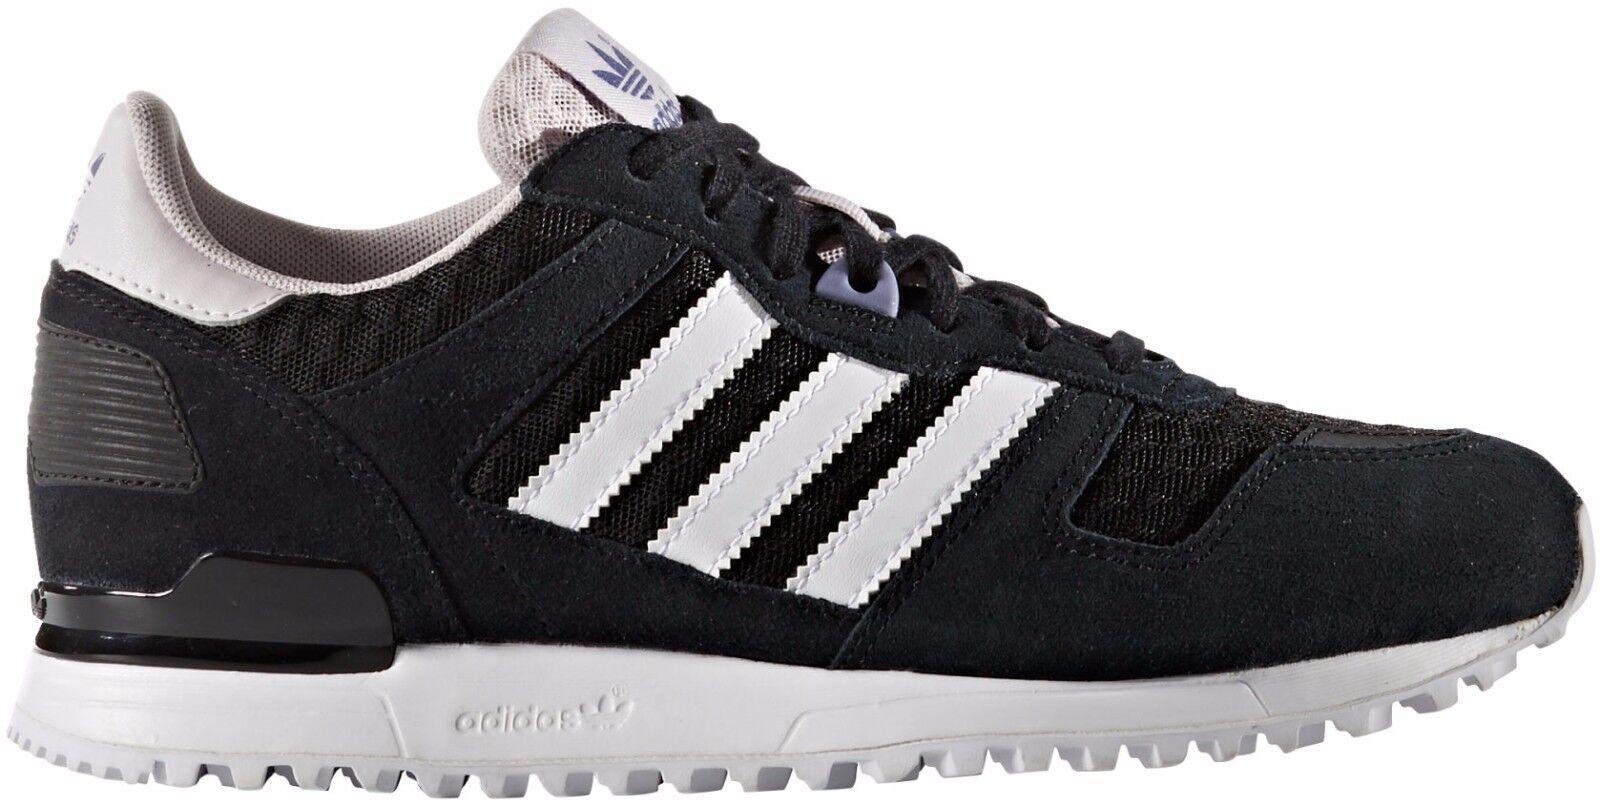 Adidas ZX 700 Black White (WS) (S79795)